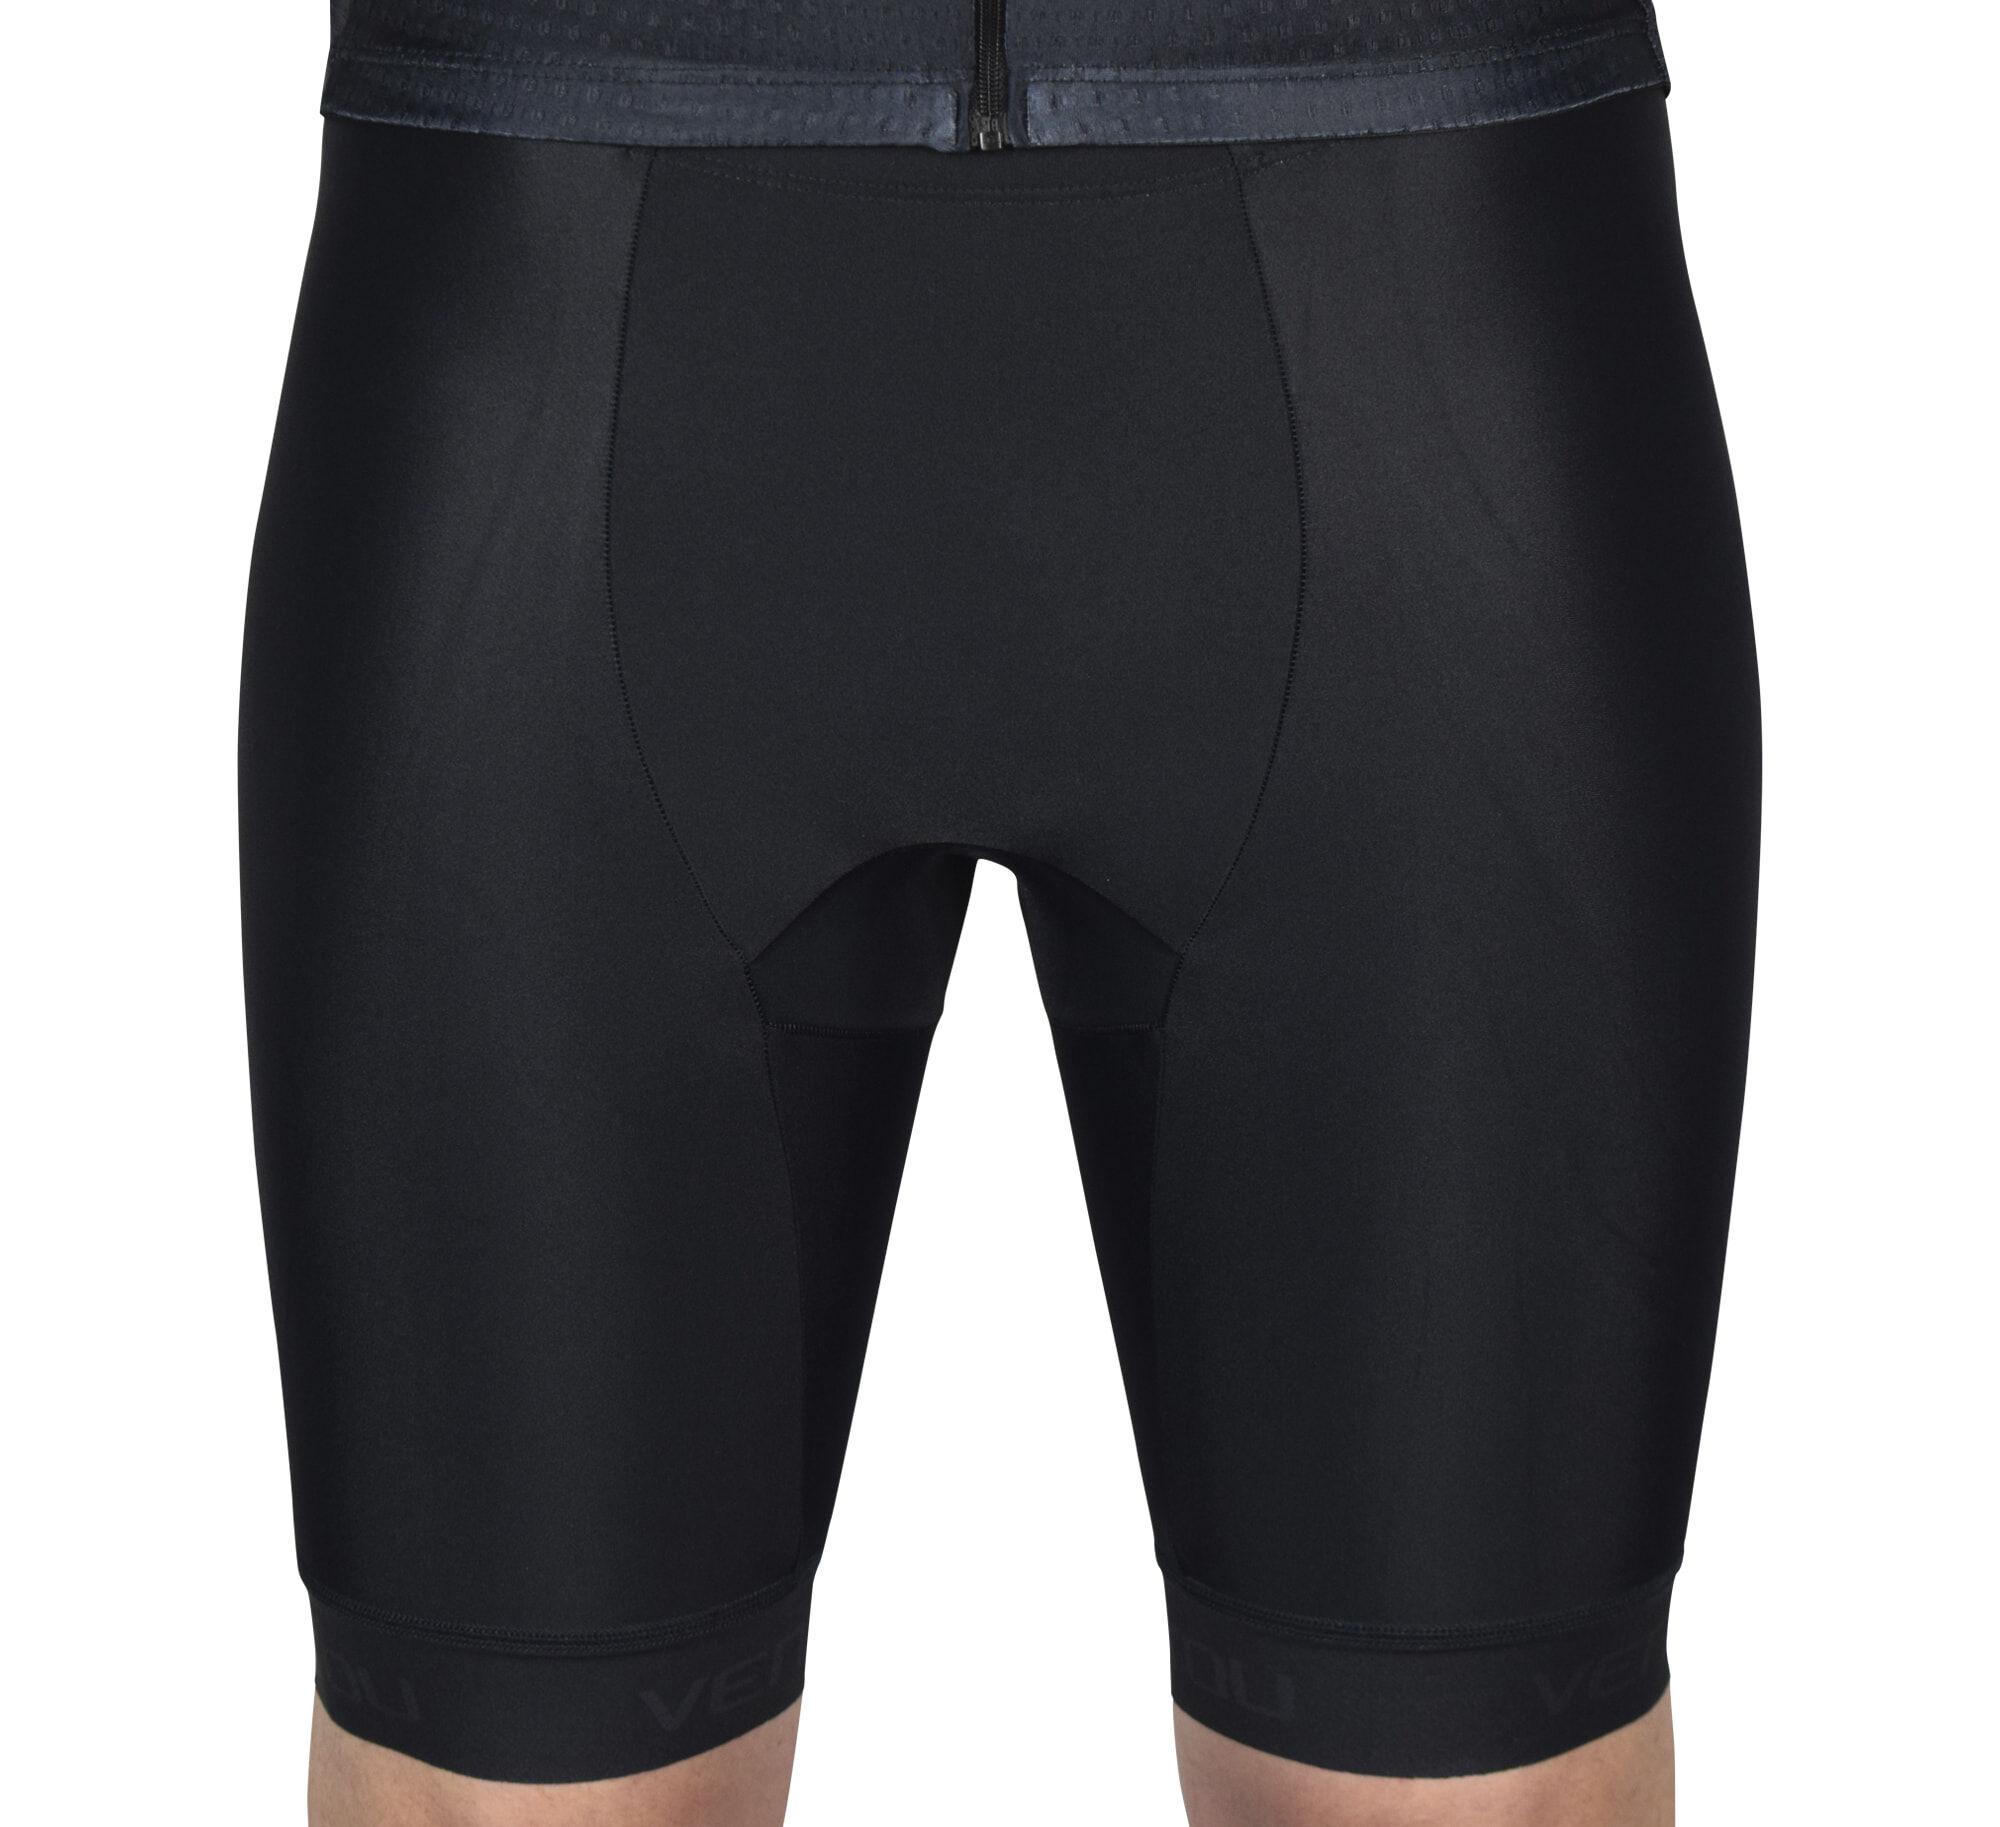 Black Tri Shorts Front 2